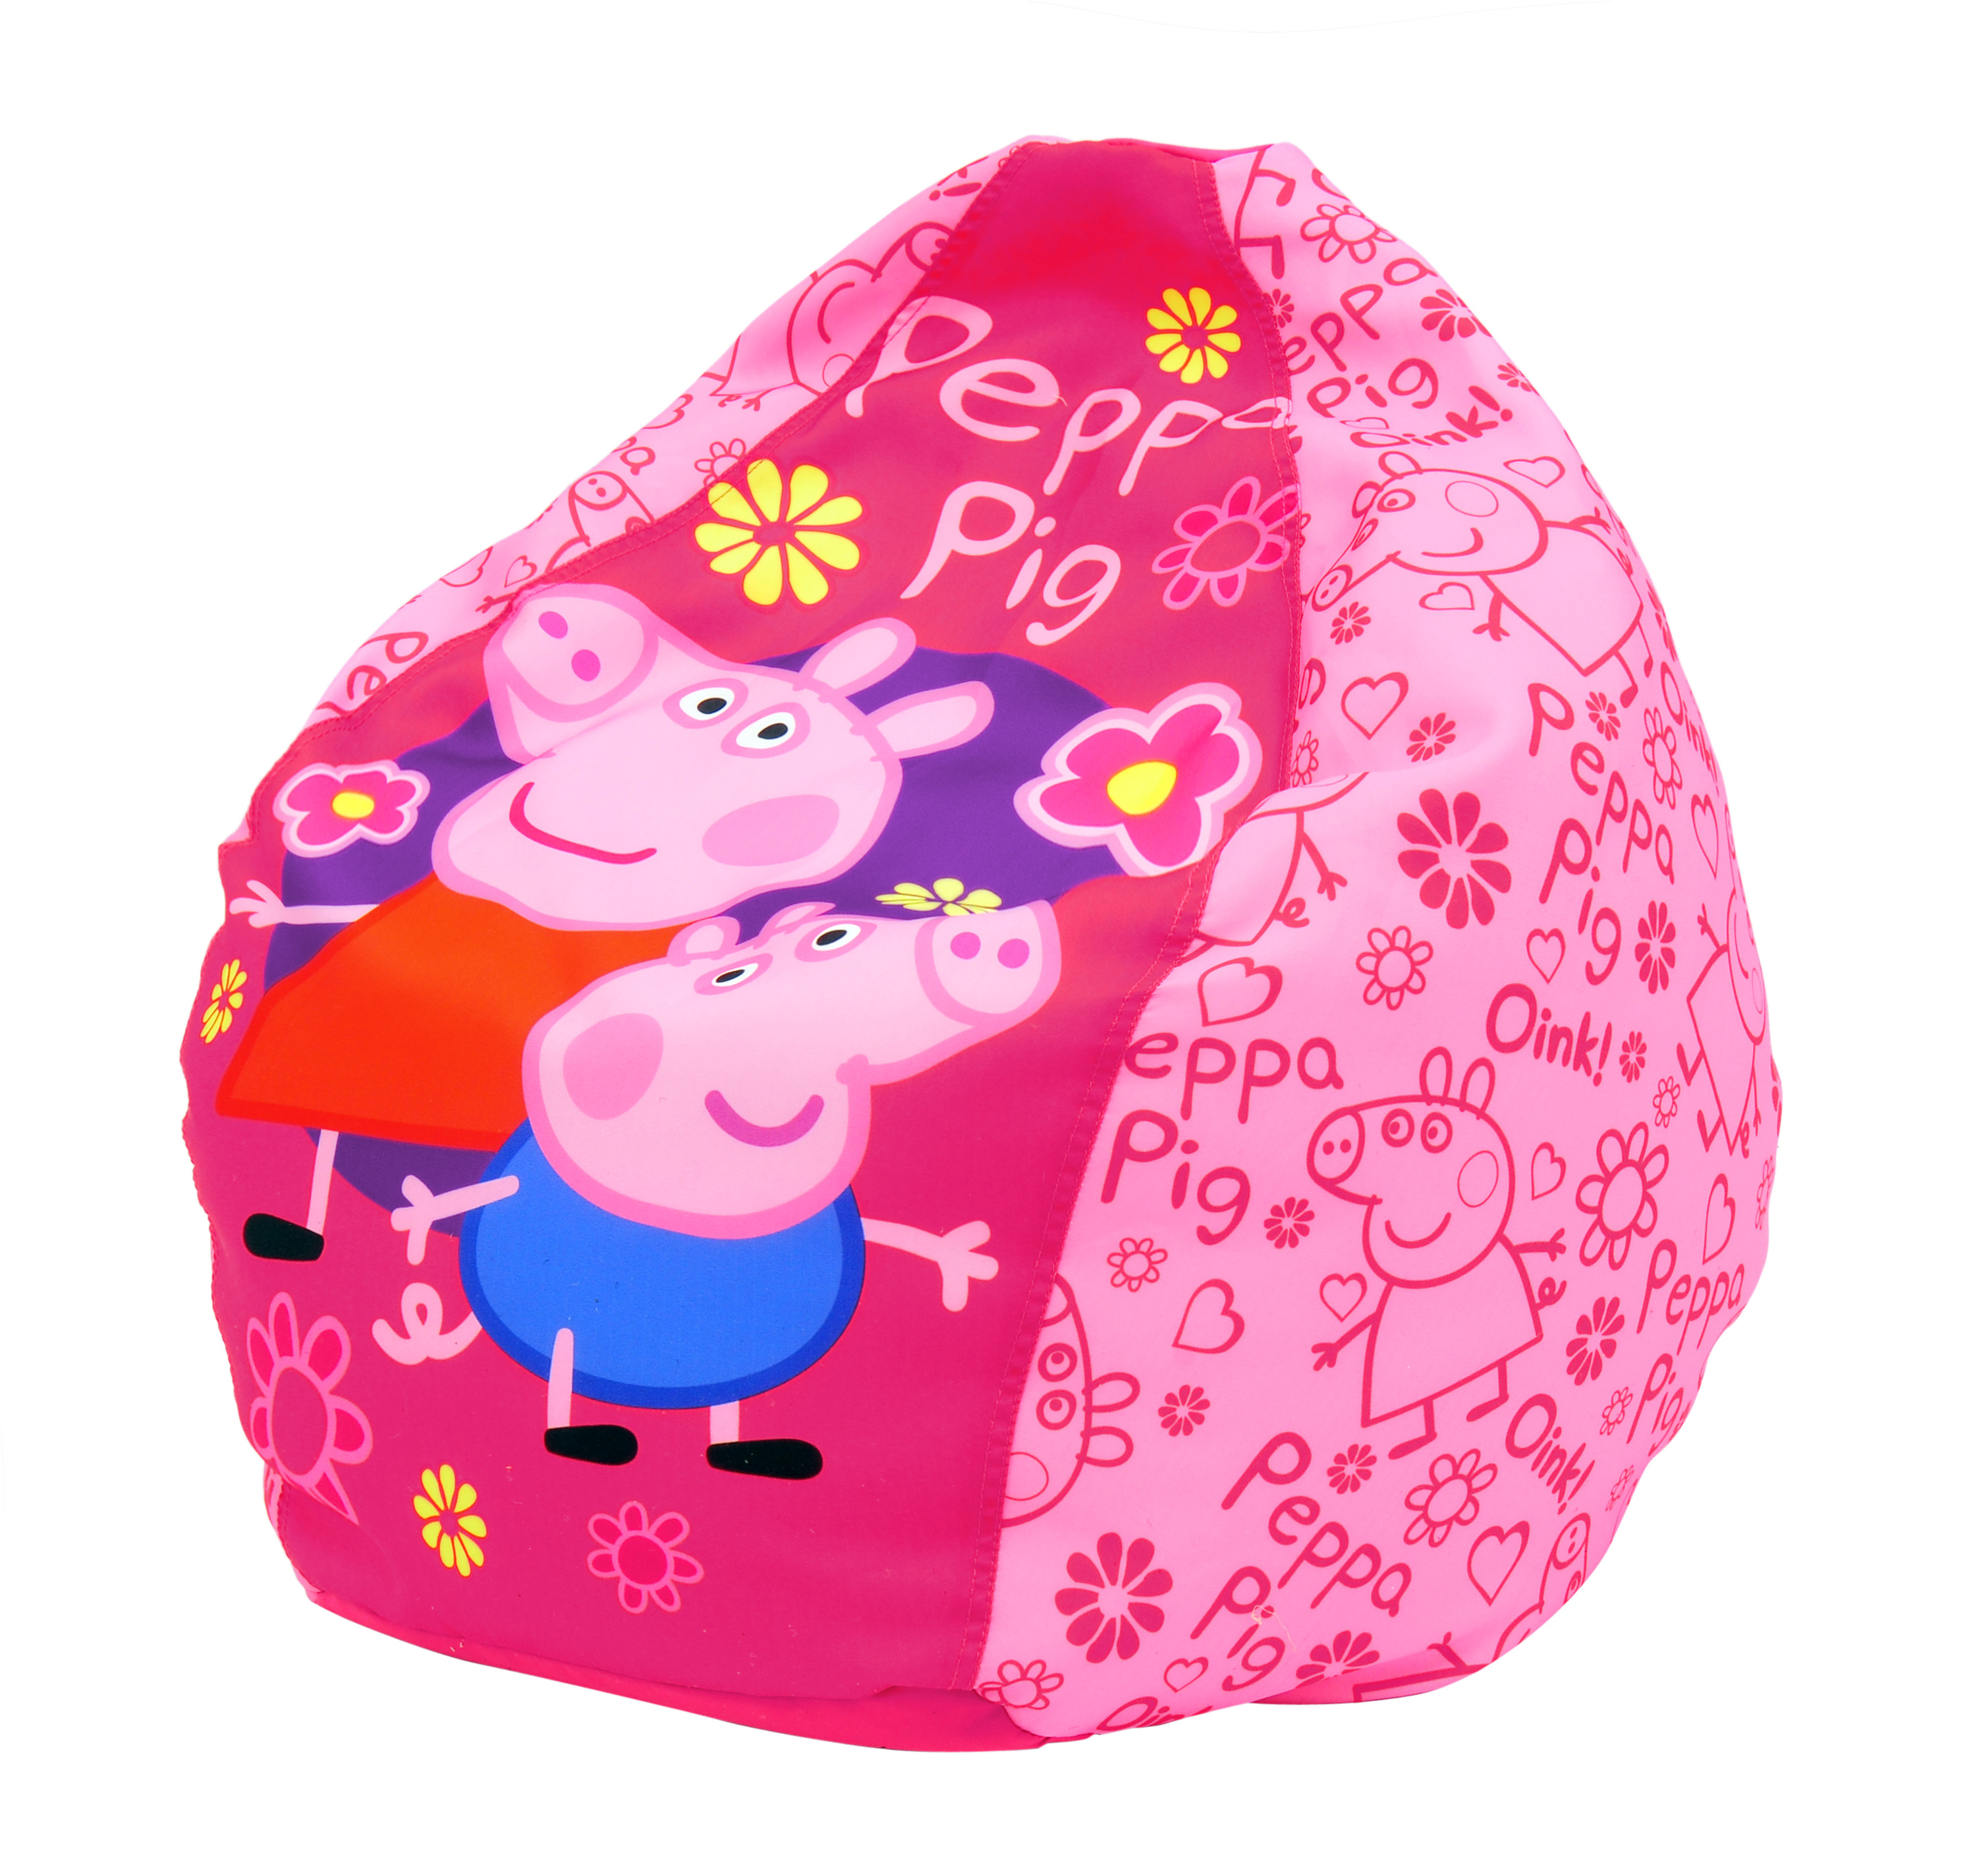 Fold Up Foam Mattresses as well Bag Organizer additionally Cream Bean Bag in addition DVTQJx Donut Bean Bags Cushions also 1218287820. on been bag chair